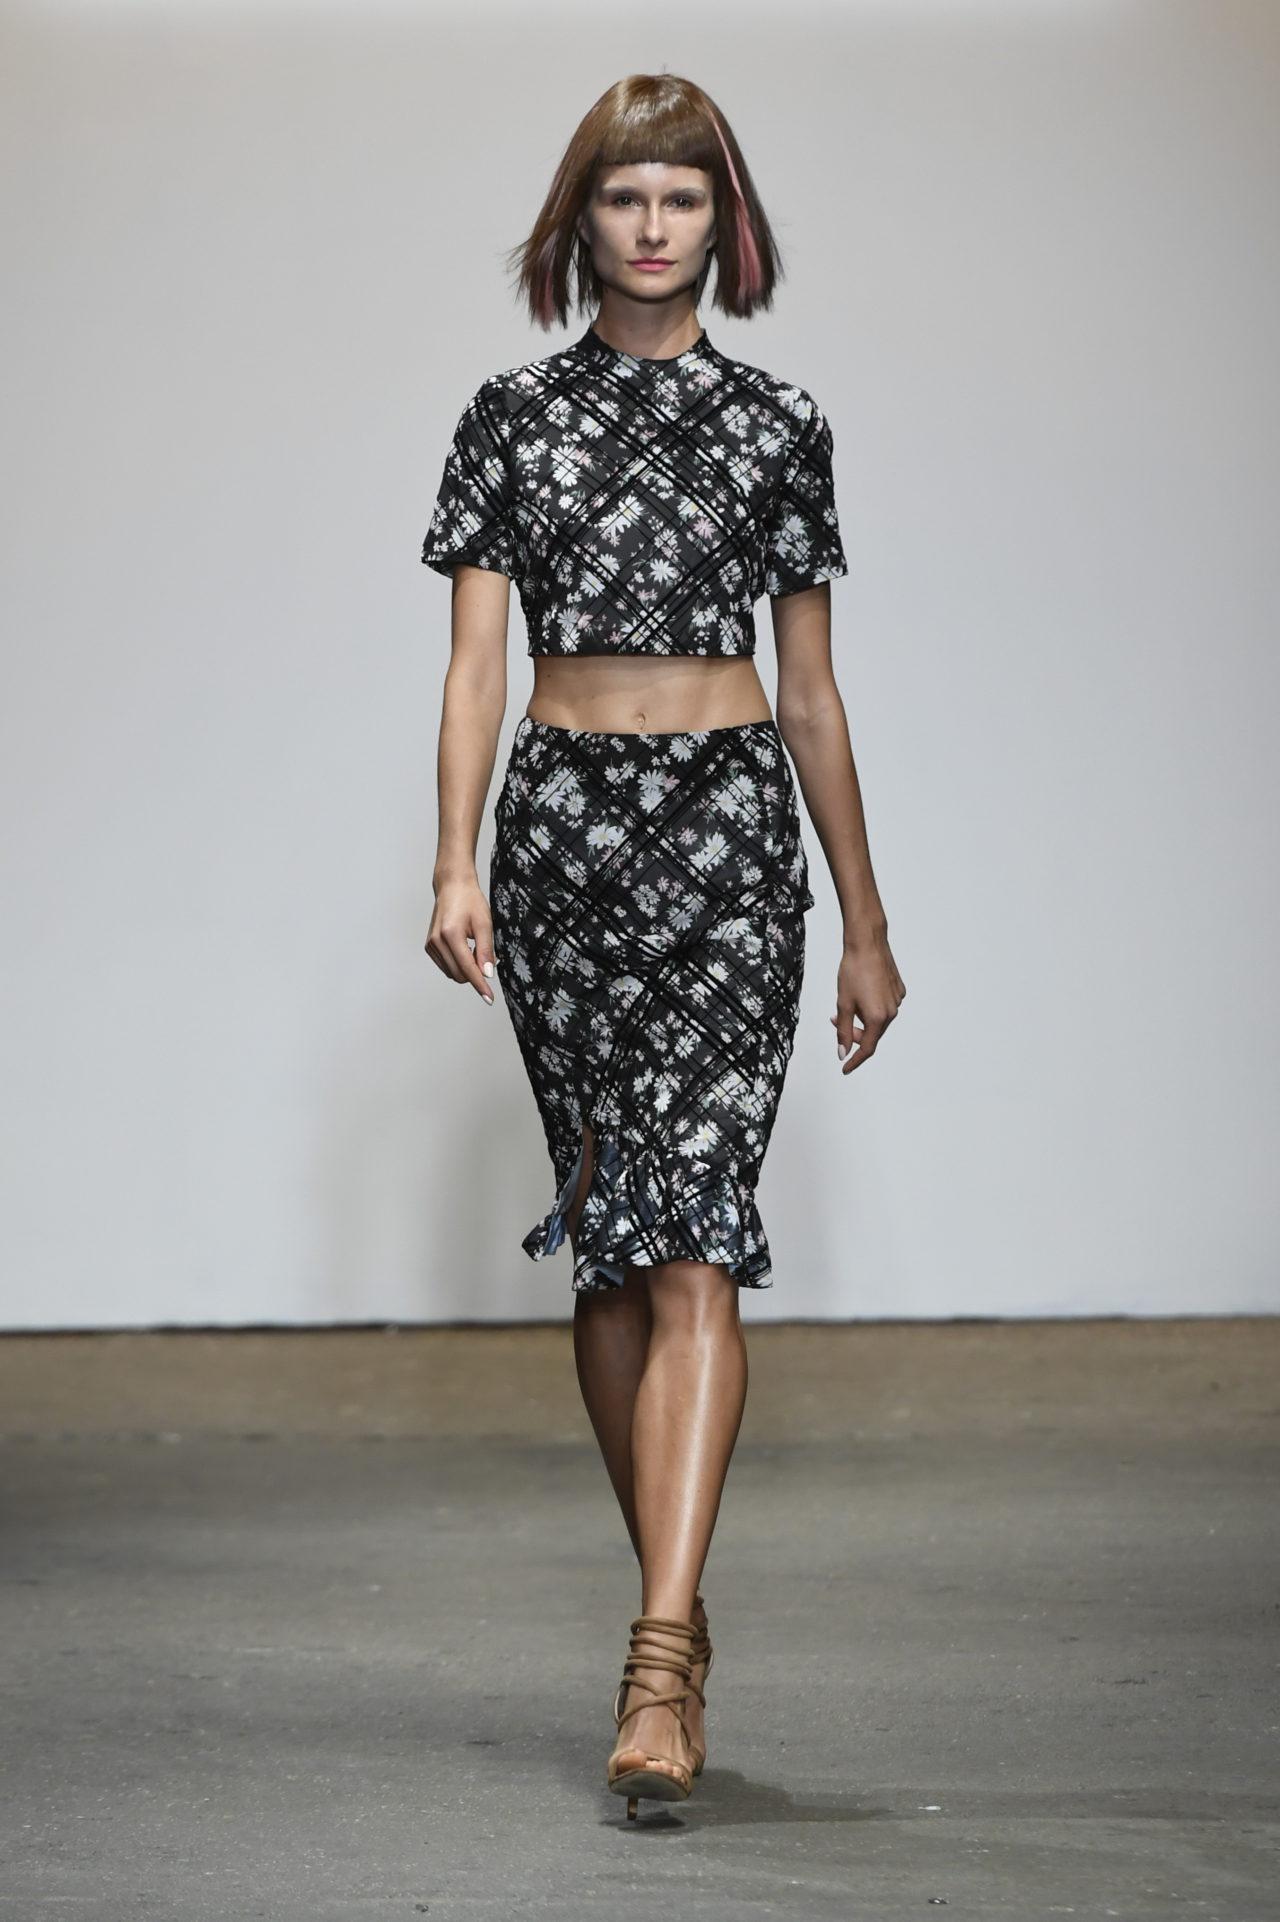 Vivienne Hu Spring/Summer 2017 New York Fashion Week Runway Show